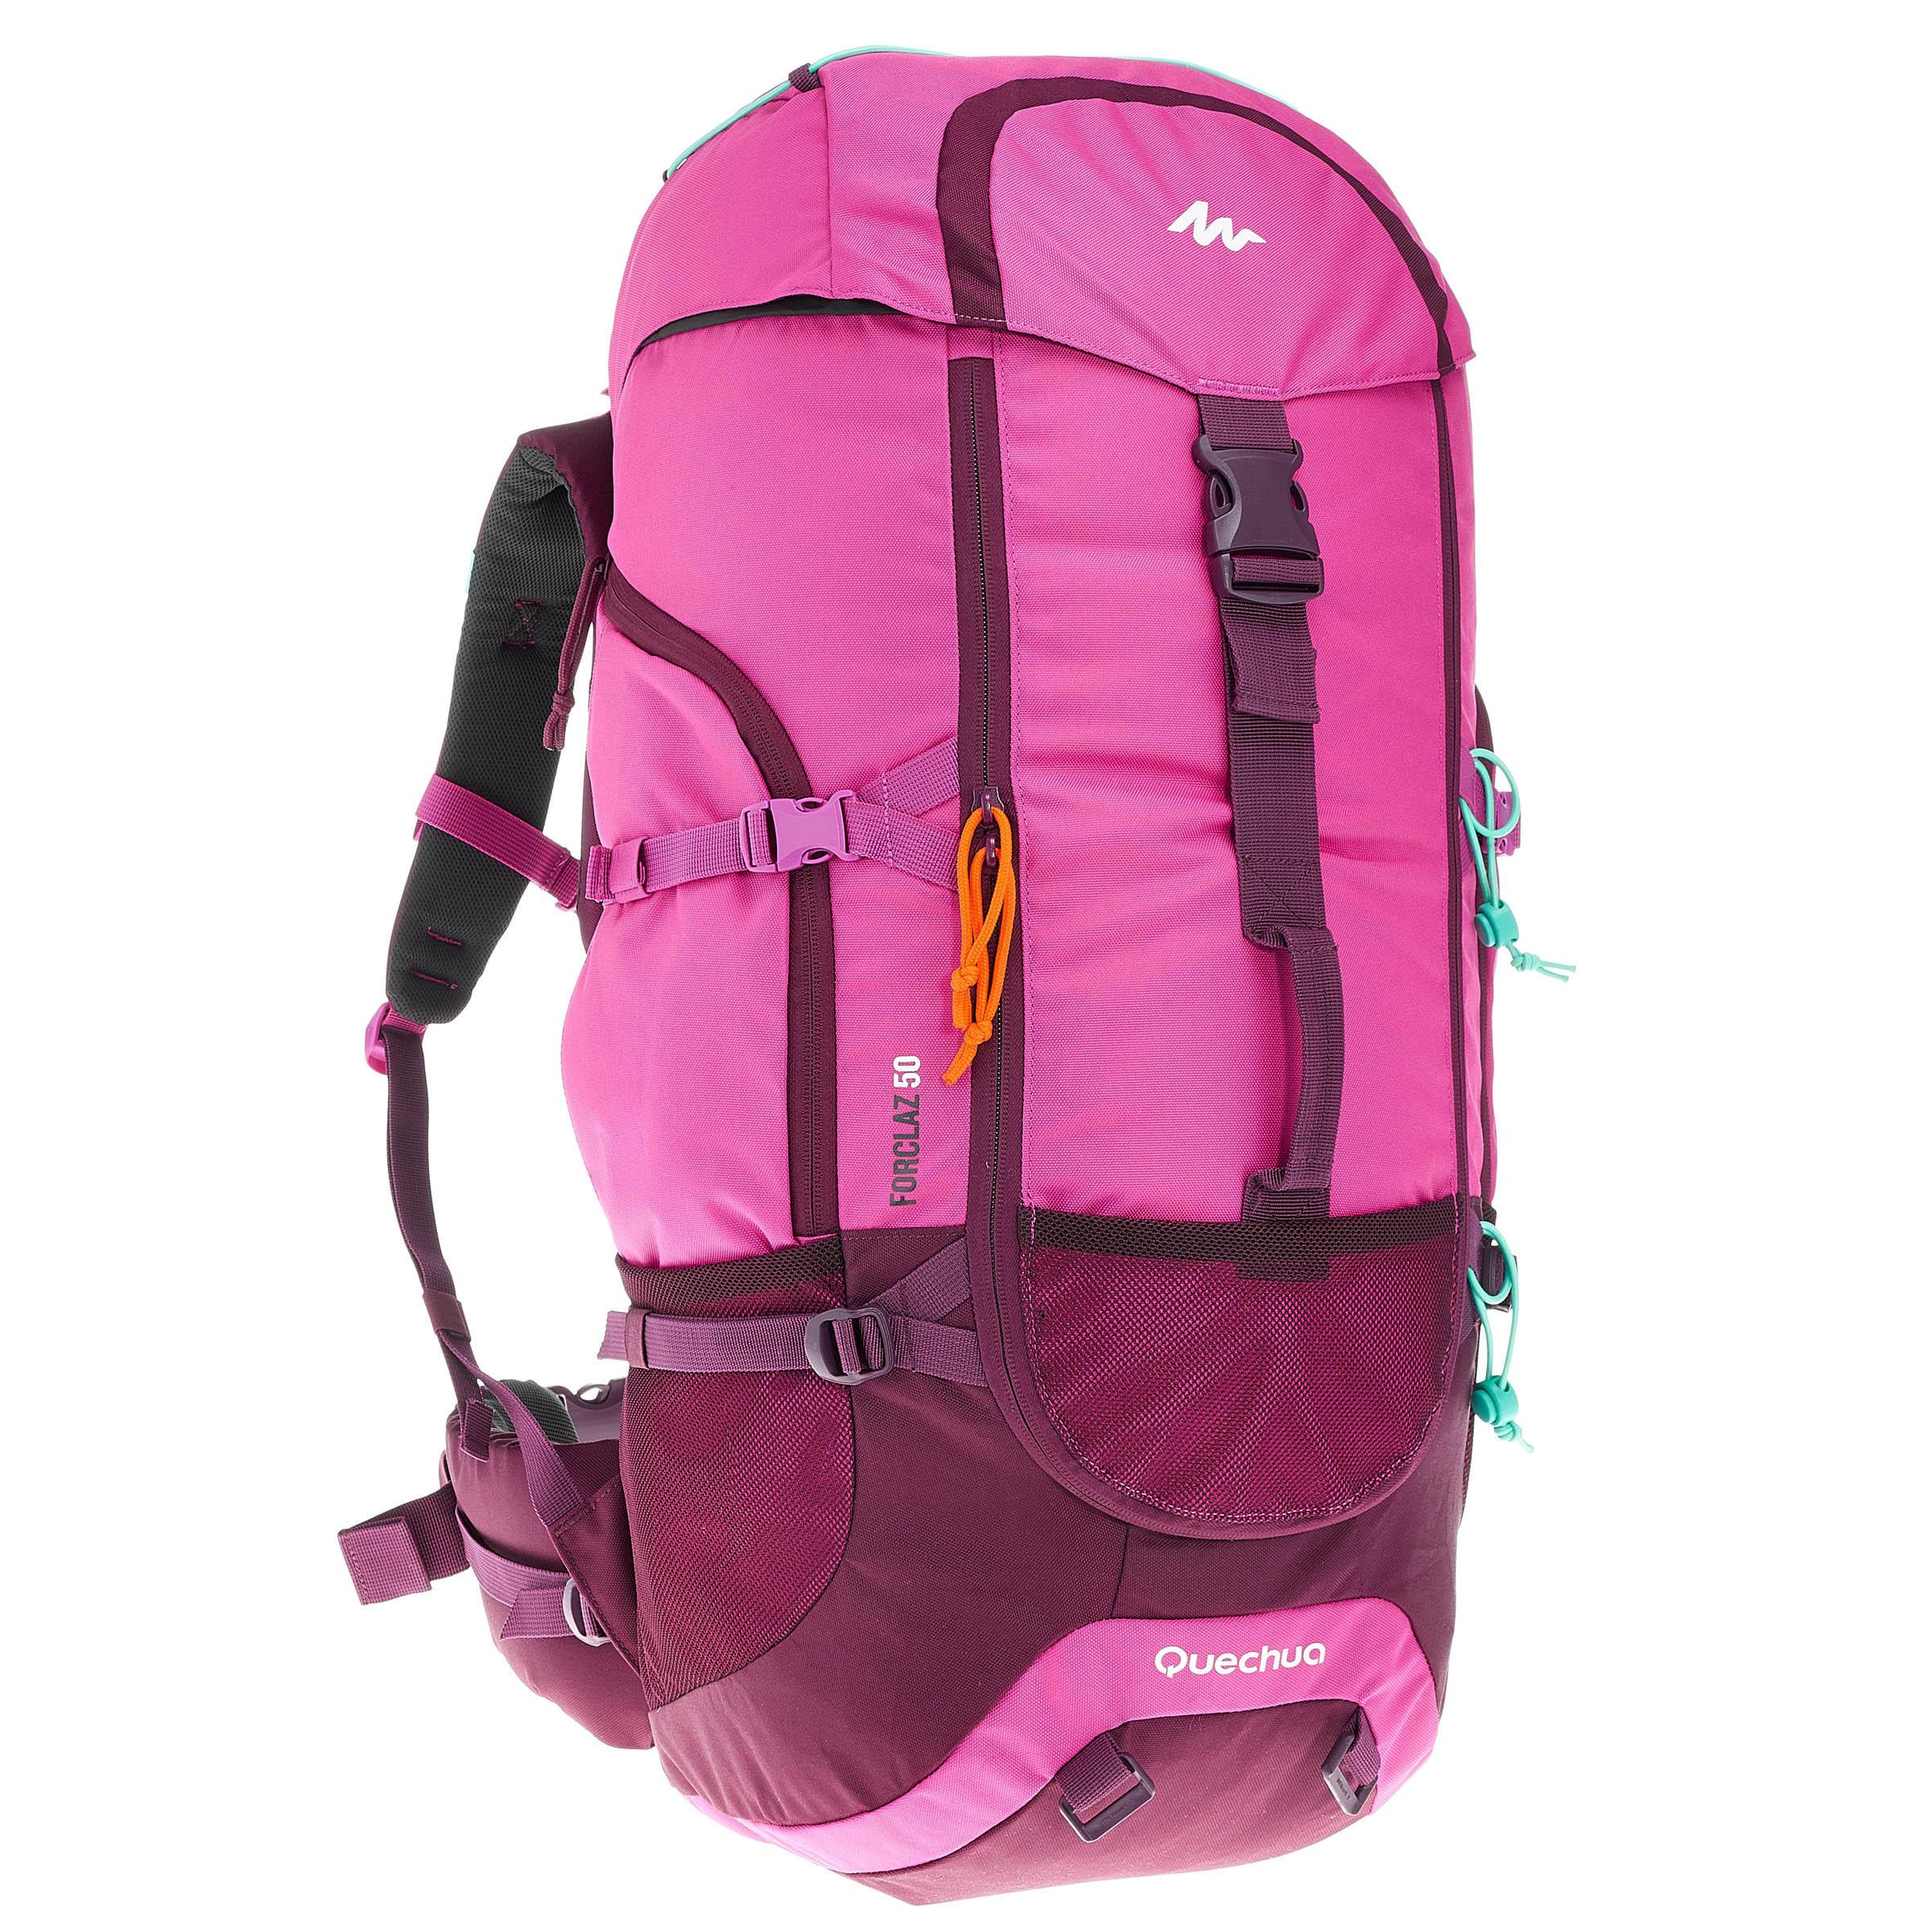 Damen,Herren Backpacking-Rucksack Forclaz 50 Liter rosa   03608439581519